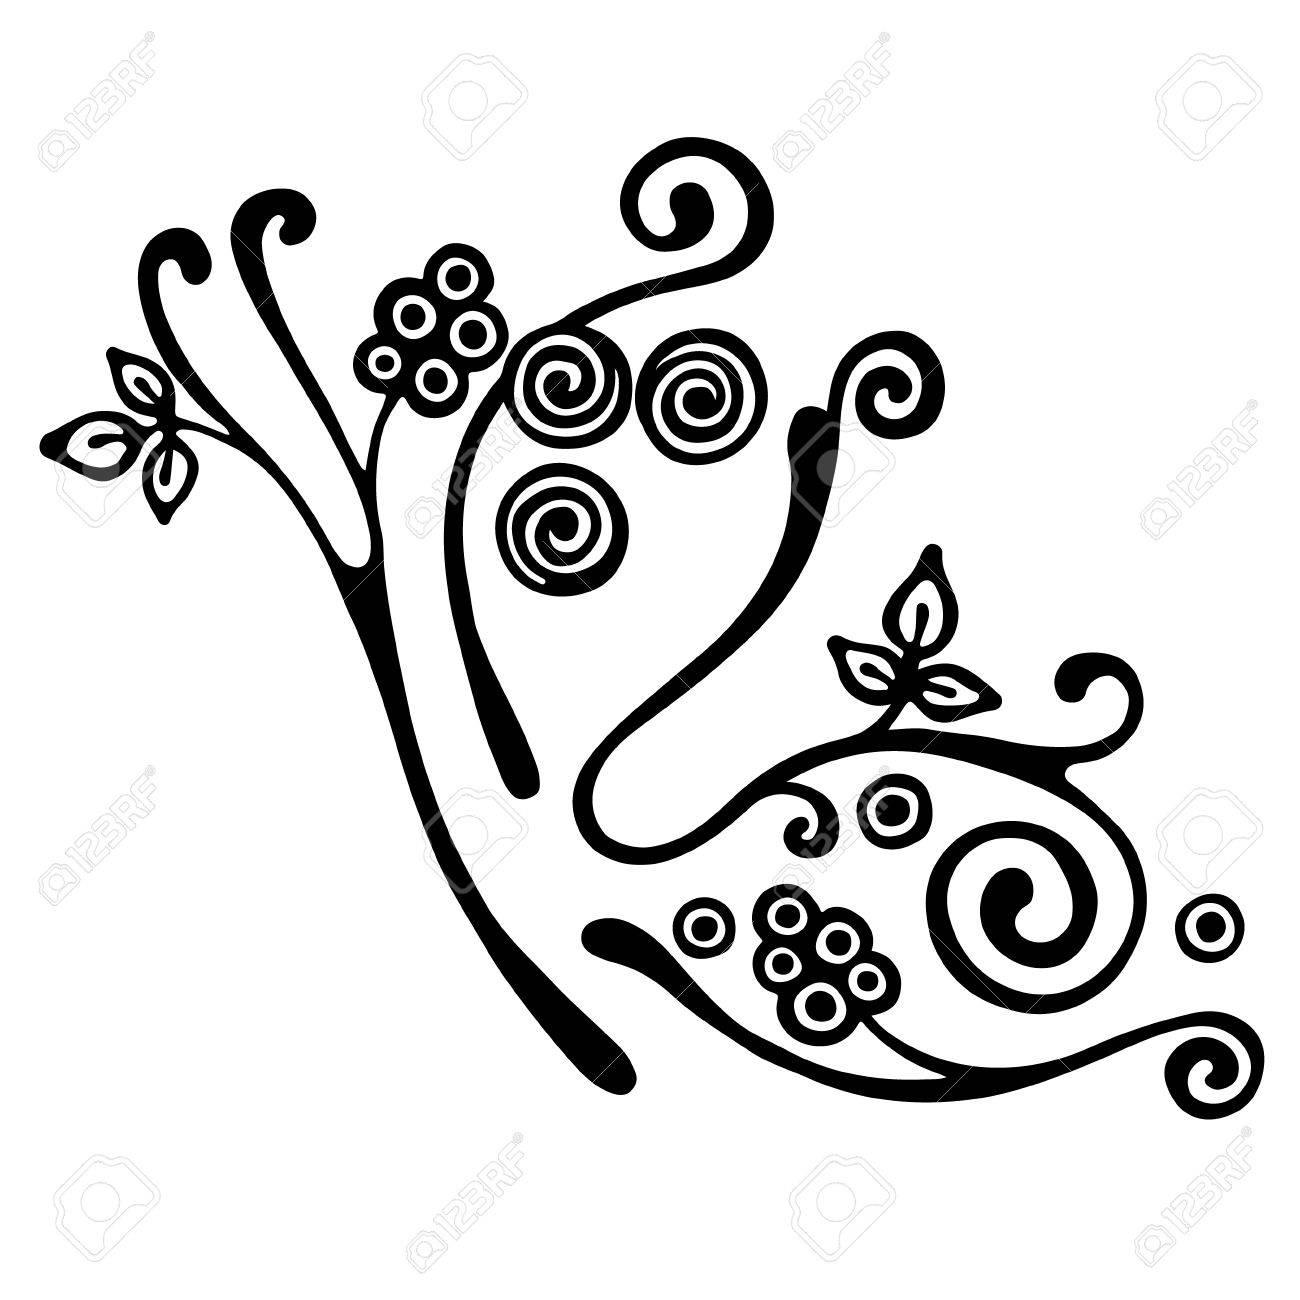 vector hand drawn illustration decorative ornamental stylized rh 123rf com ornament vector png ornament vector frame